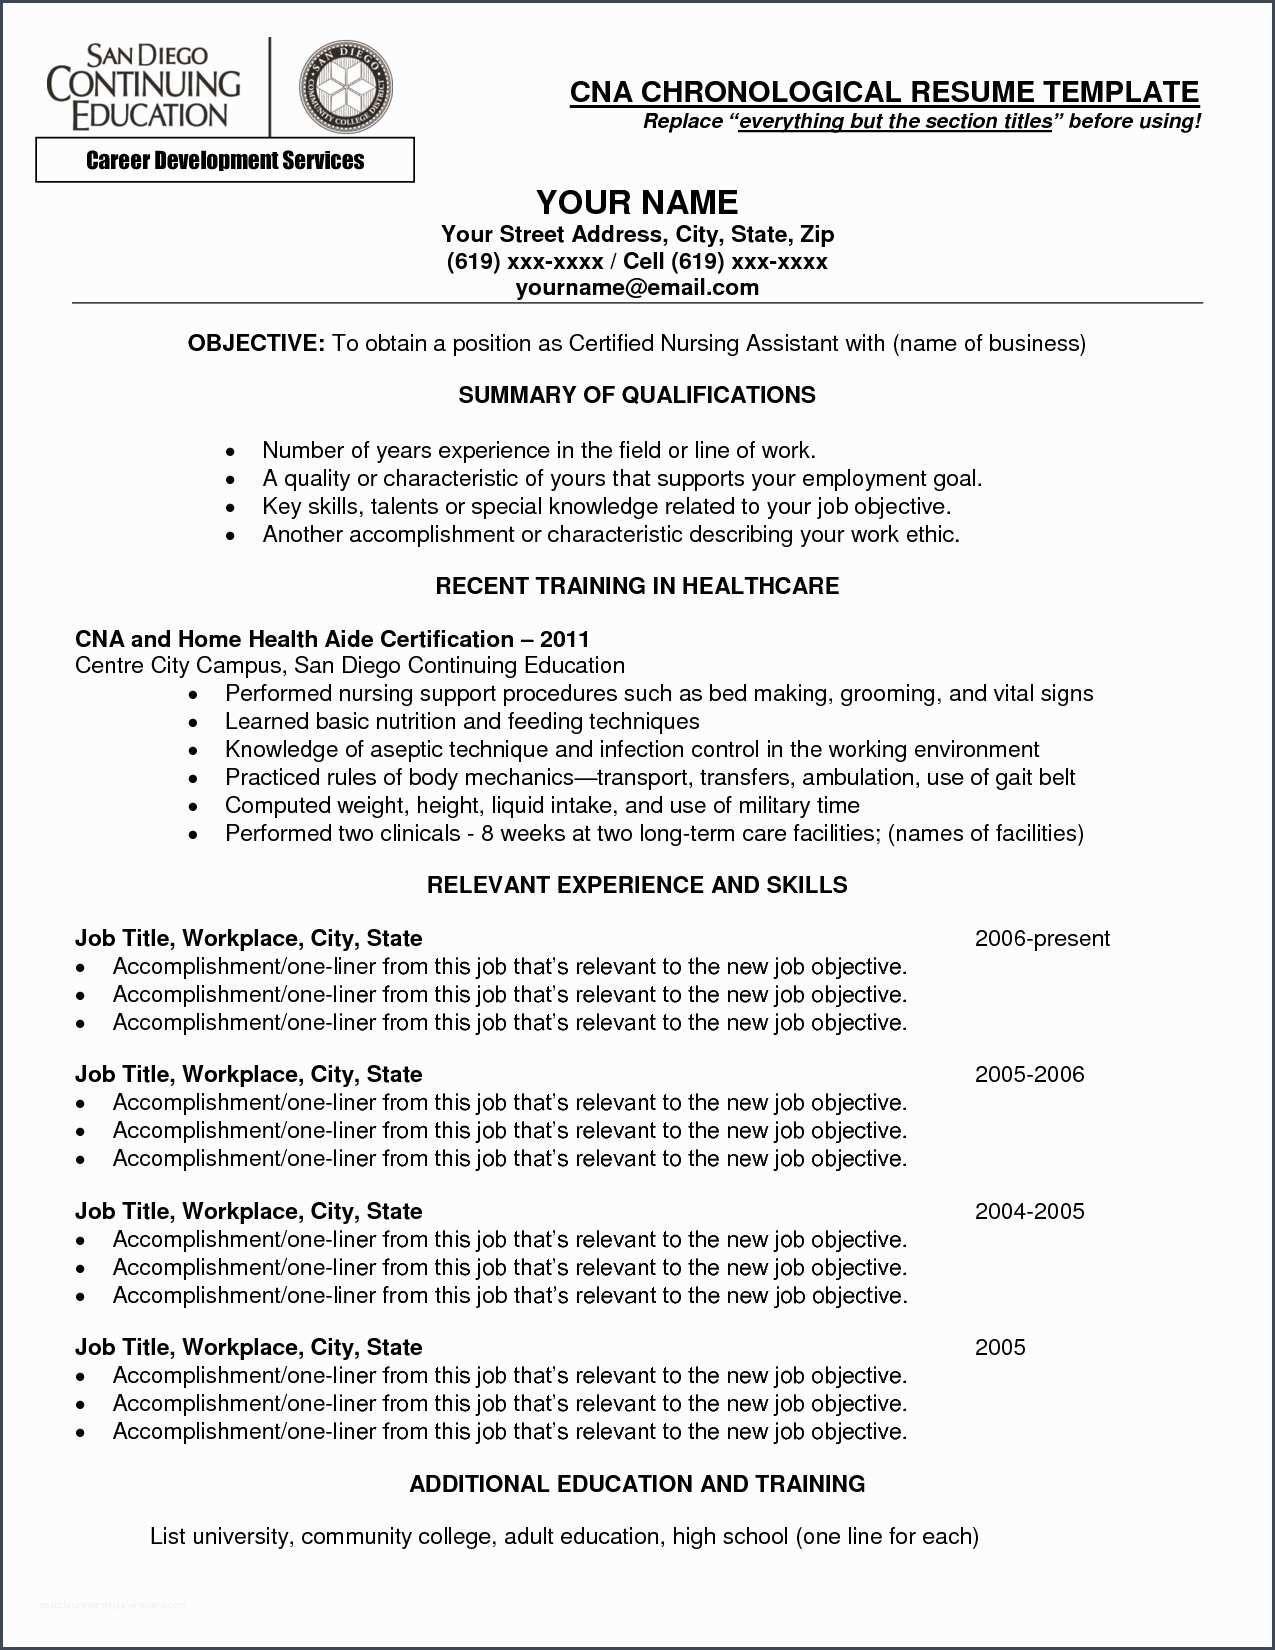 Referencecna Resume Objective